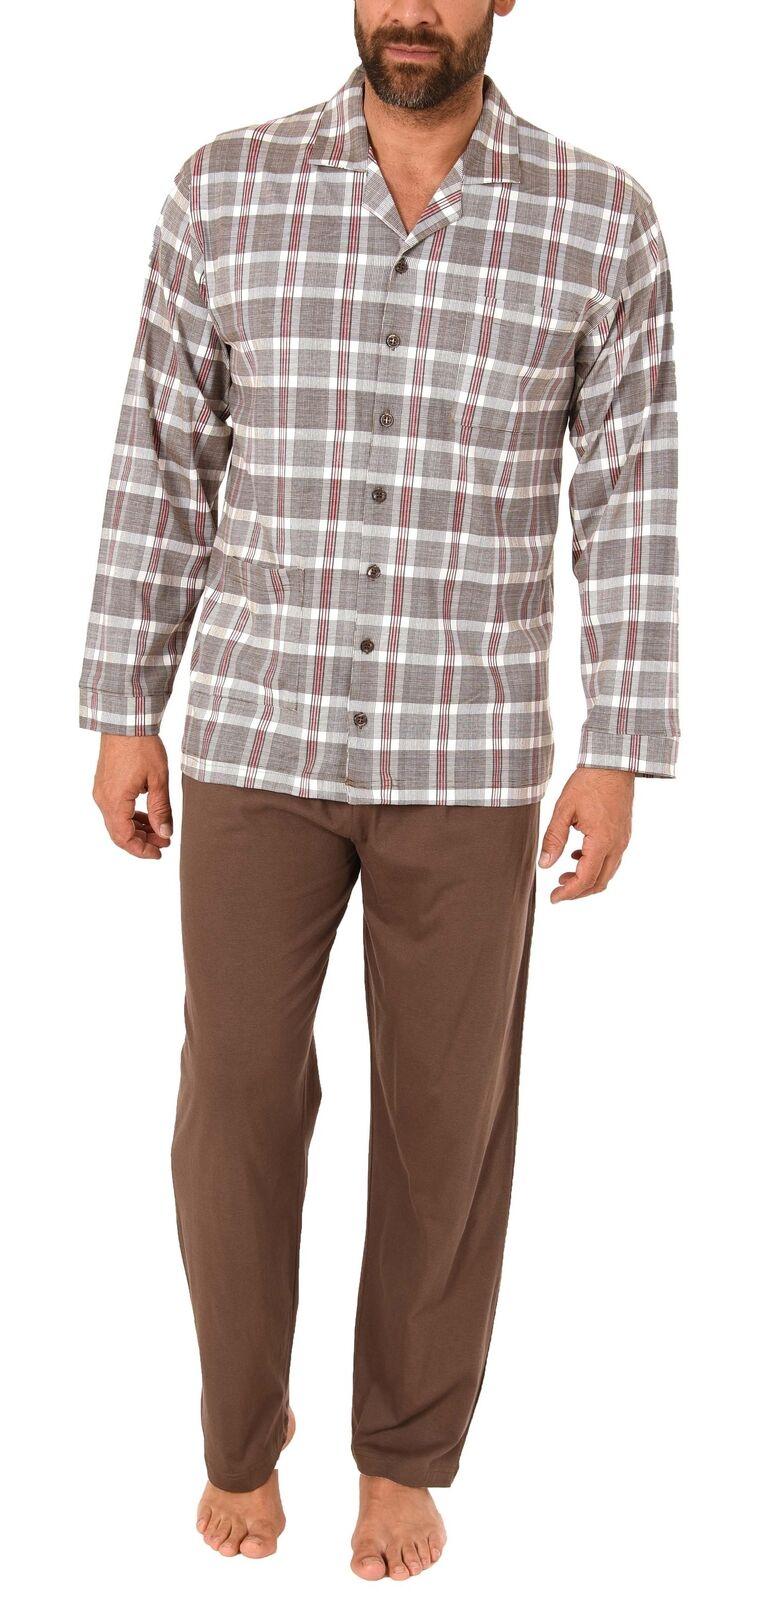 Herren Pyjama Schlafanzug langarm zum durchknöpfen durchknöpfen durchknöpfen – 281 101 90 441 | New Product 2019  2ac088